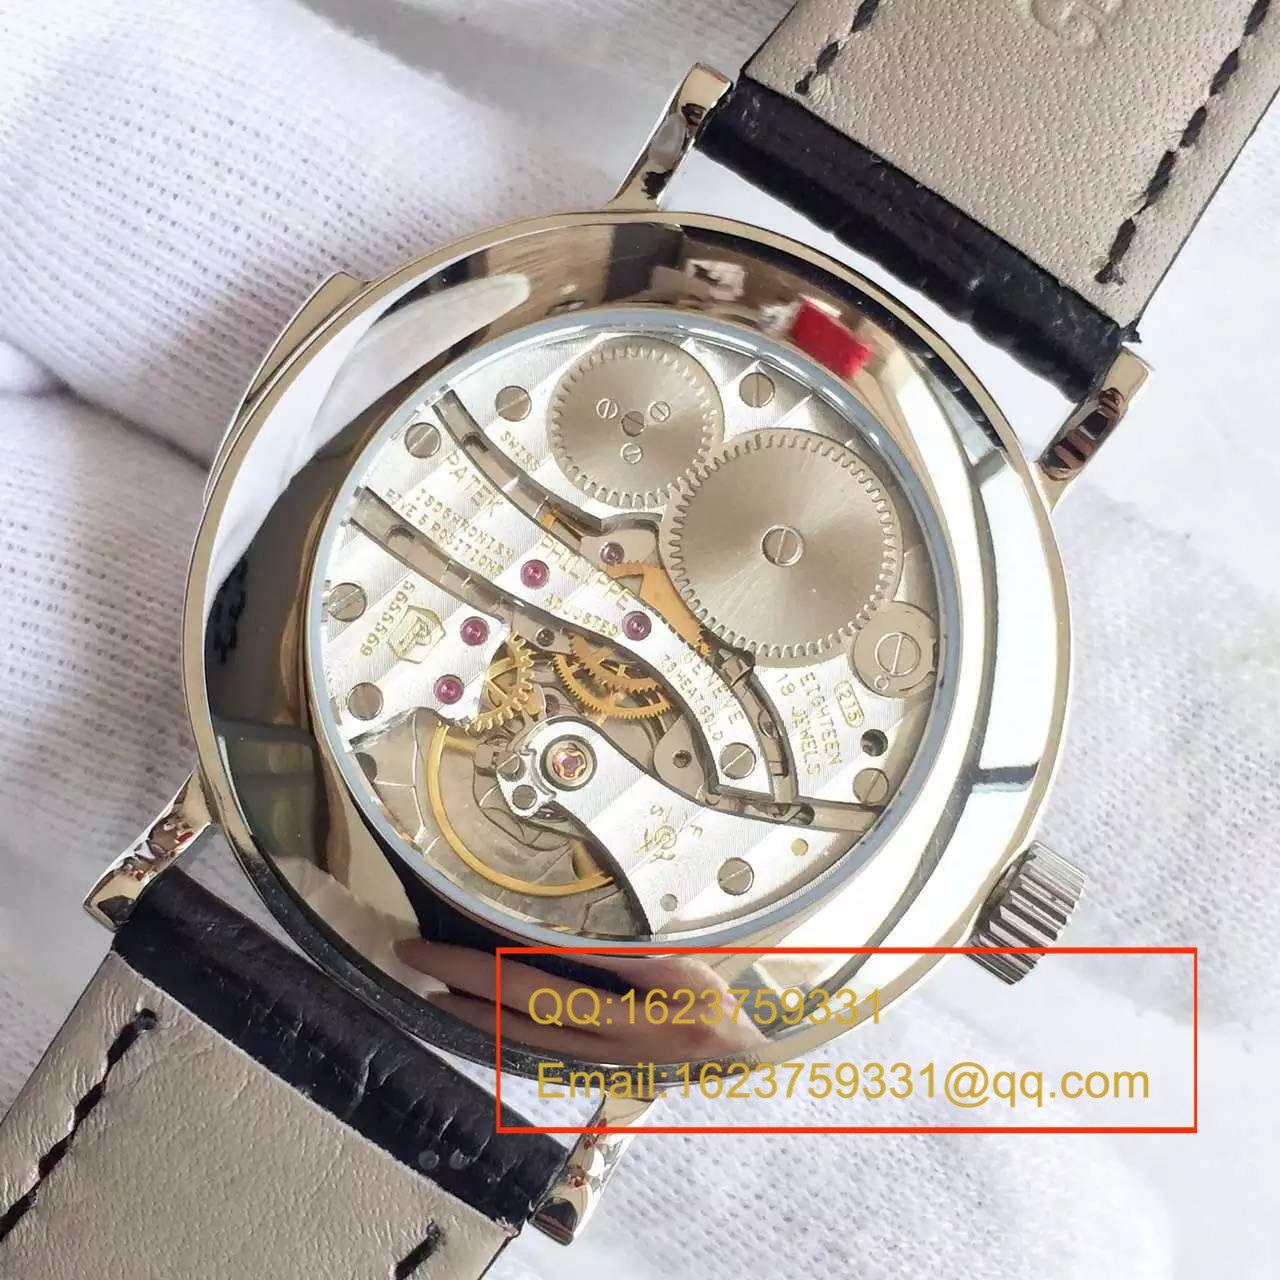 【HT一比一超A高仿手表】百达翡丽-复杂功能计时腕表系列 5078P-001 机械男表 / BD141